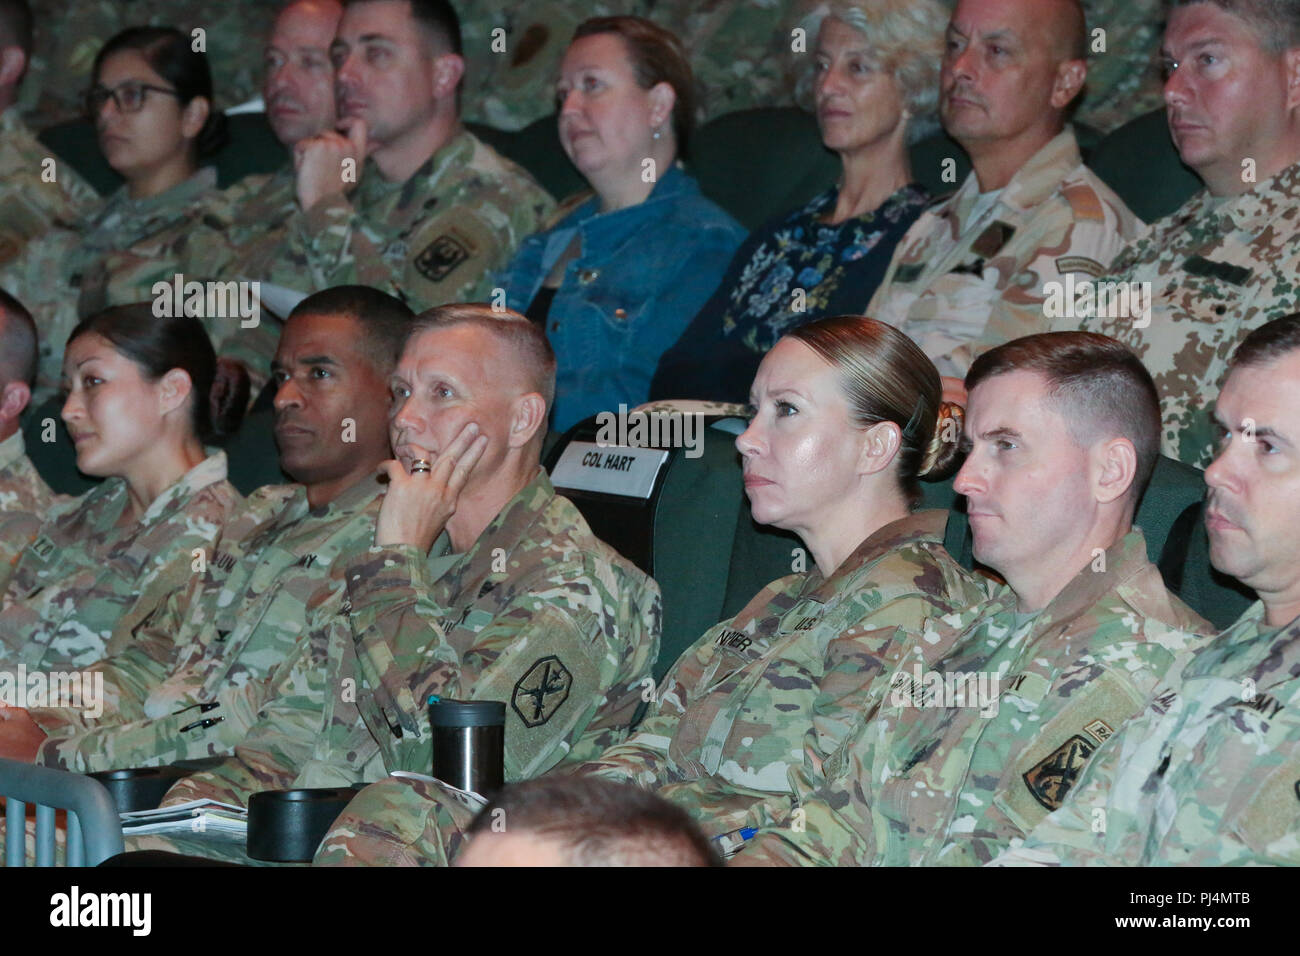 Army columbus ga